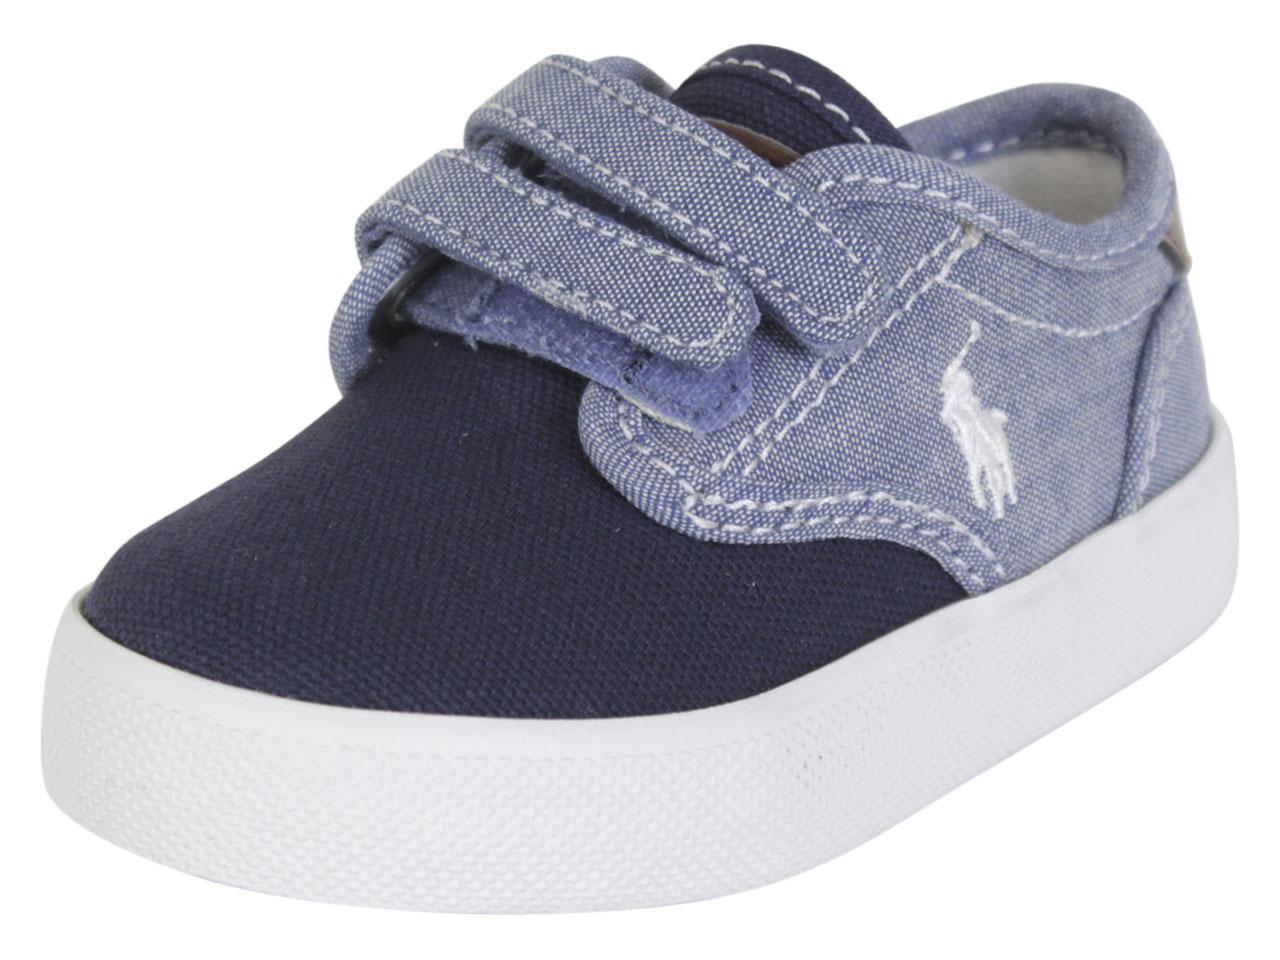 pretty nice footwear a few days away Polo Ralph Lauren Toddler Boy's Luwes-EZ Sneakers Shoes